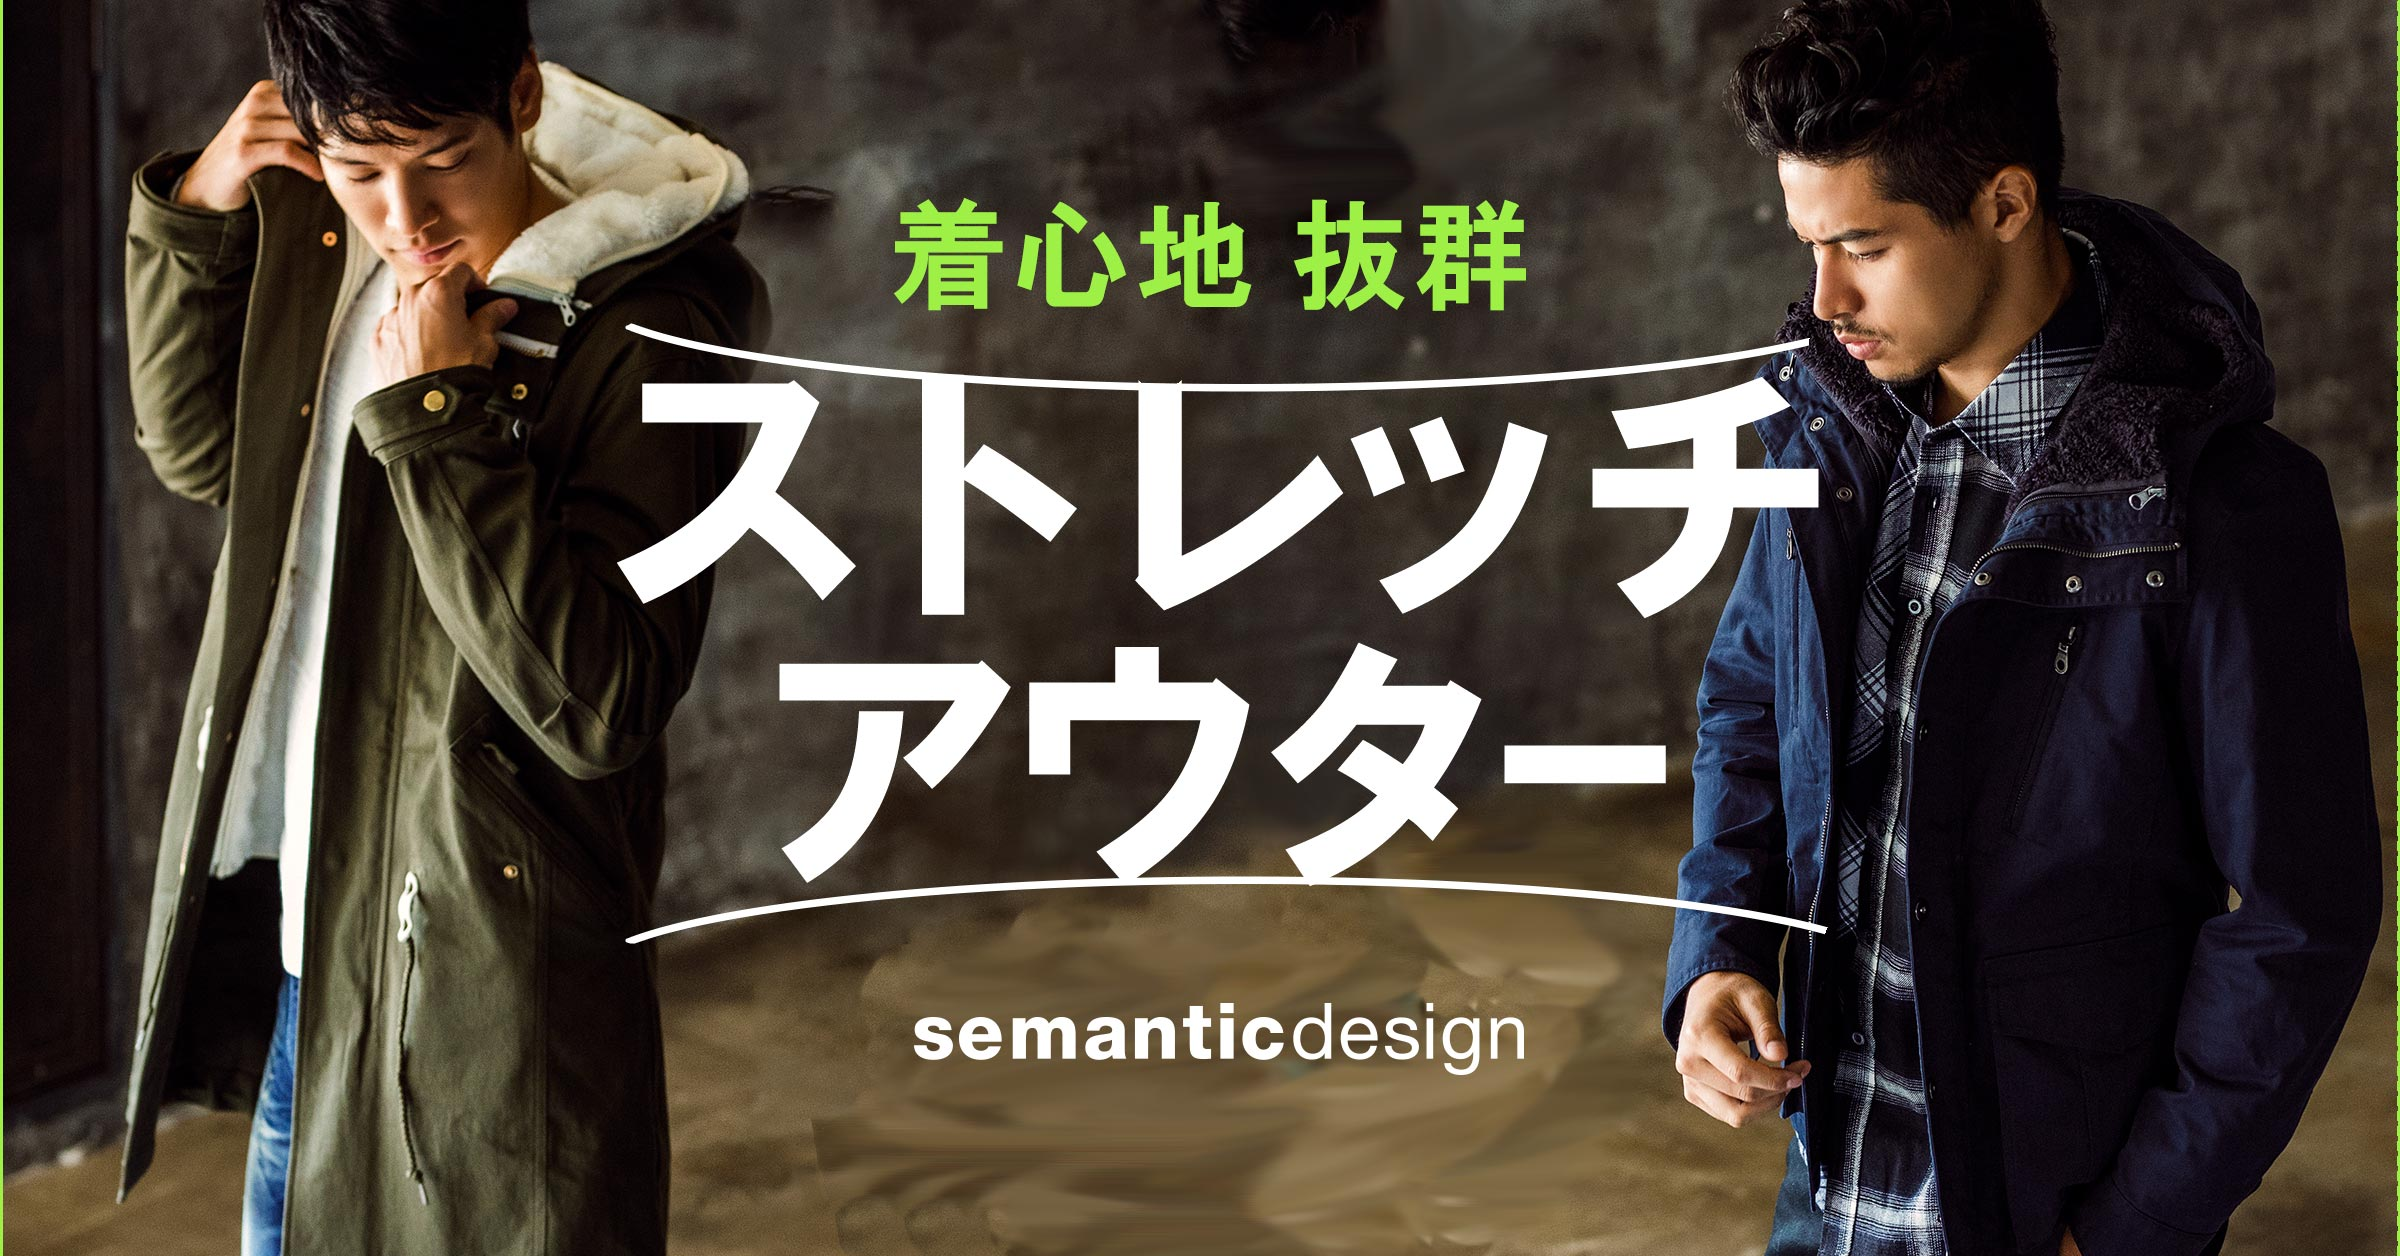 semanticdesign ストレッチアウター特集